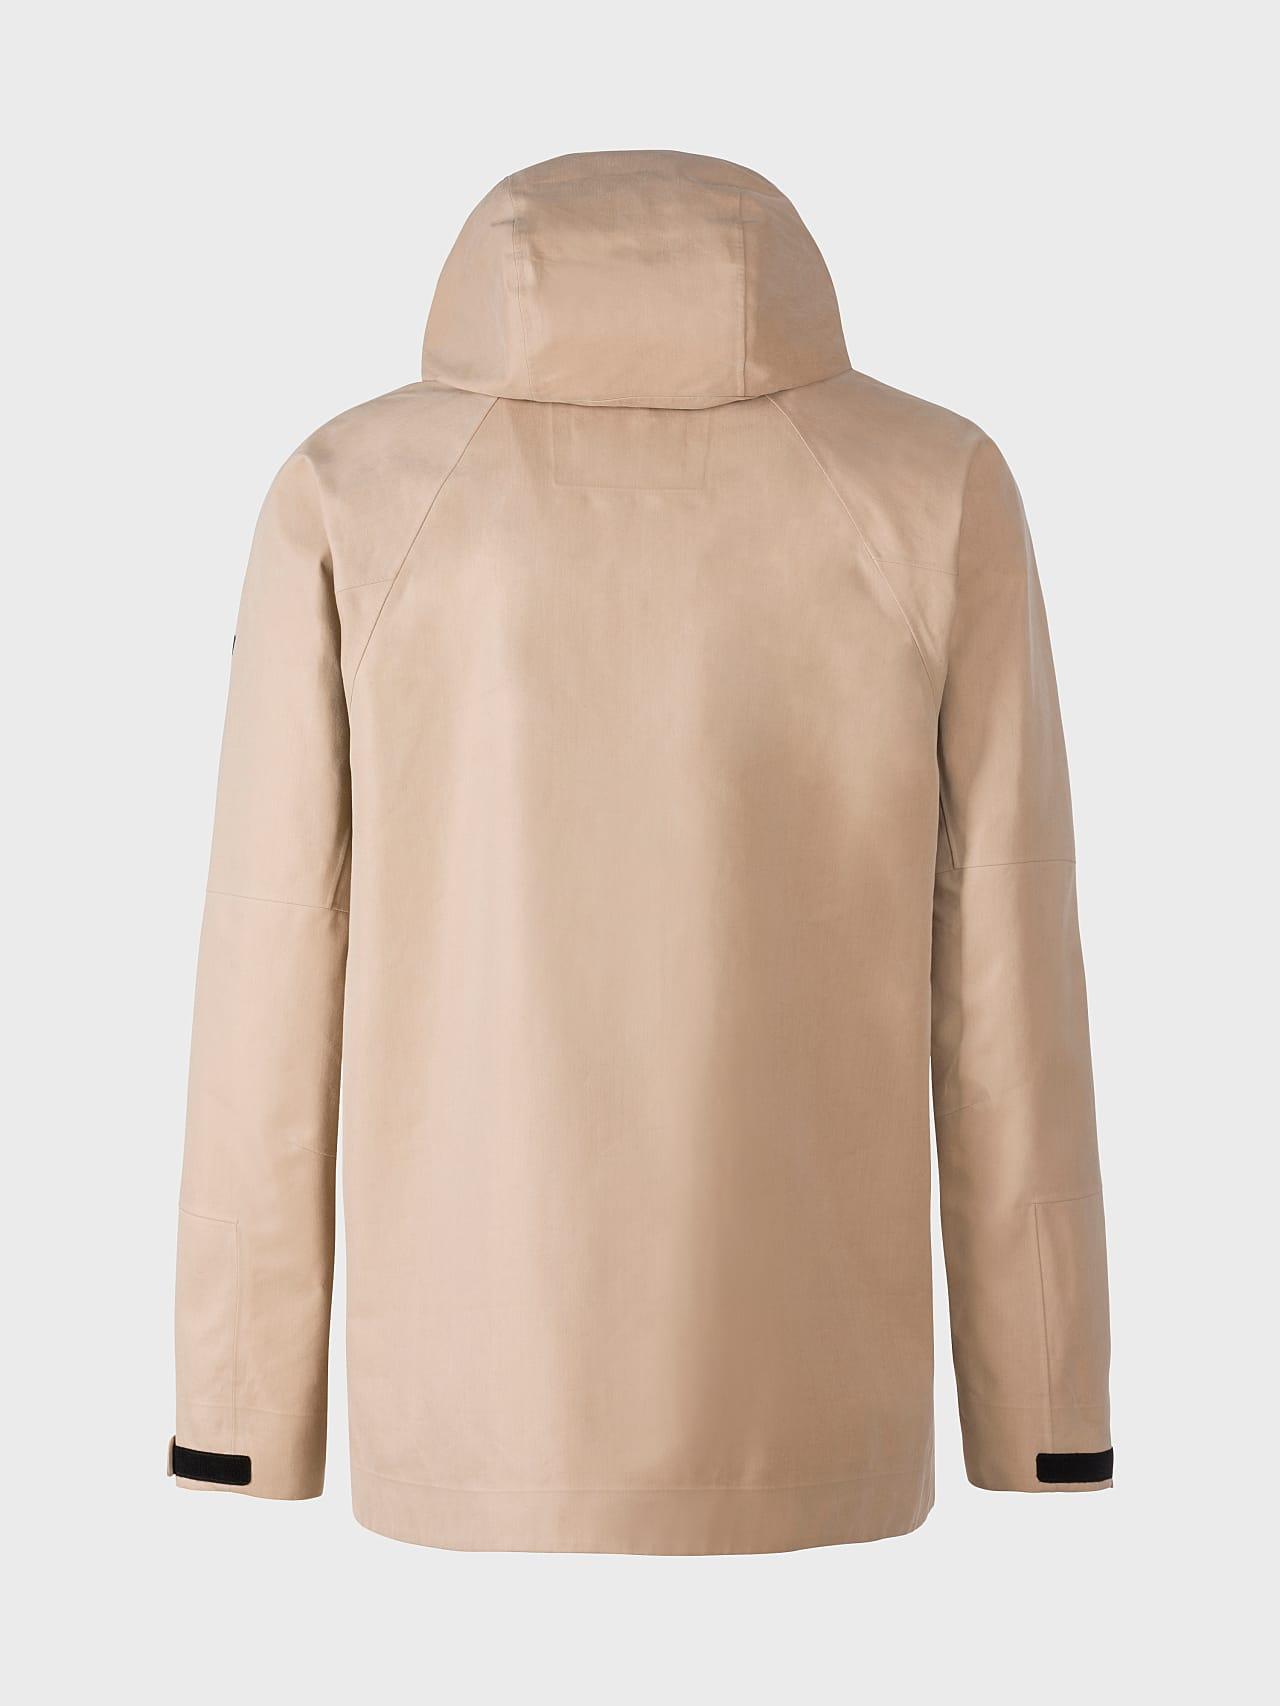 OKOVO V3.Y5.01 Packable Waterproof Jacket Sand Left Alpha Tauri